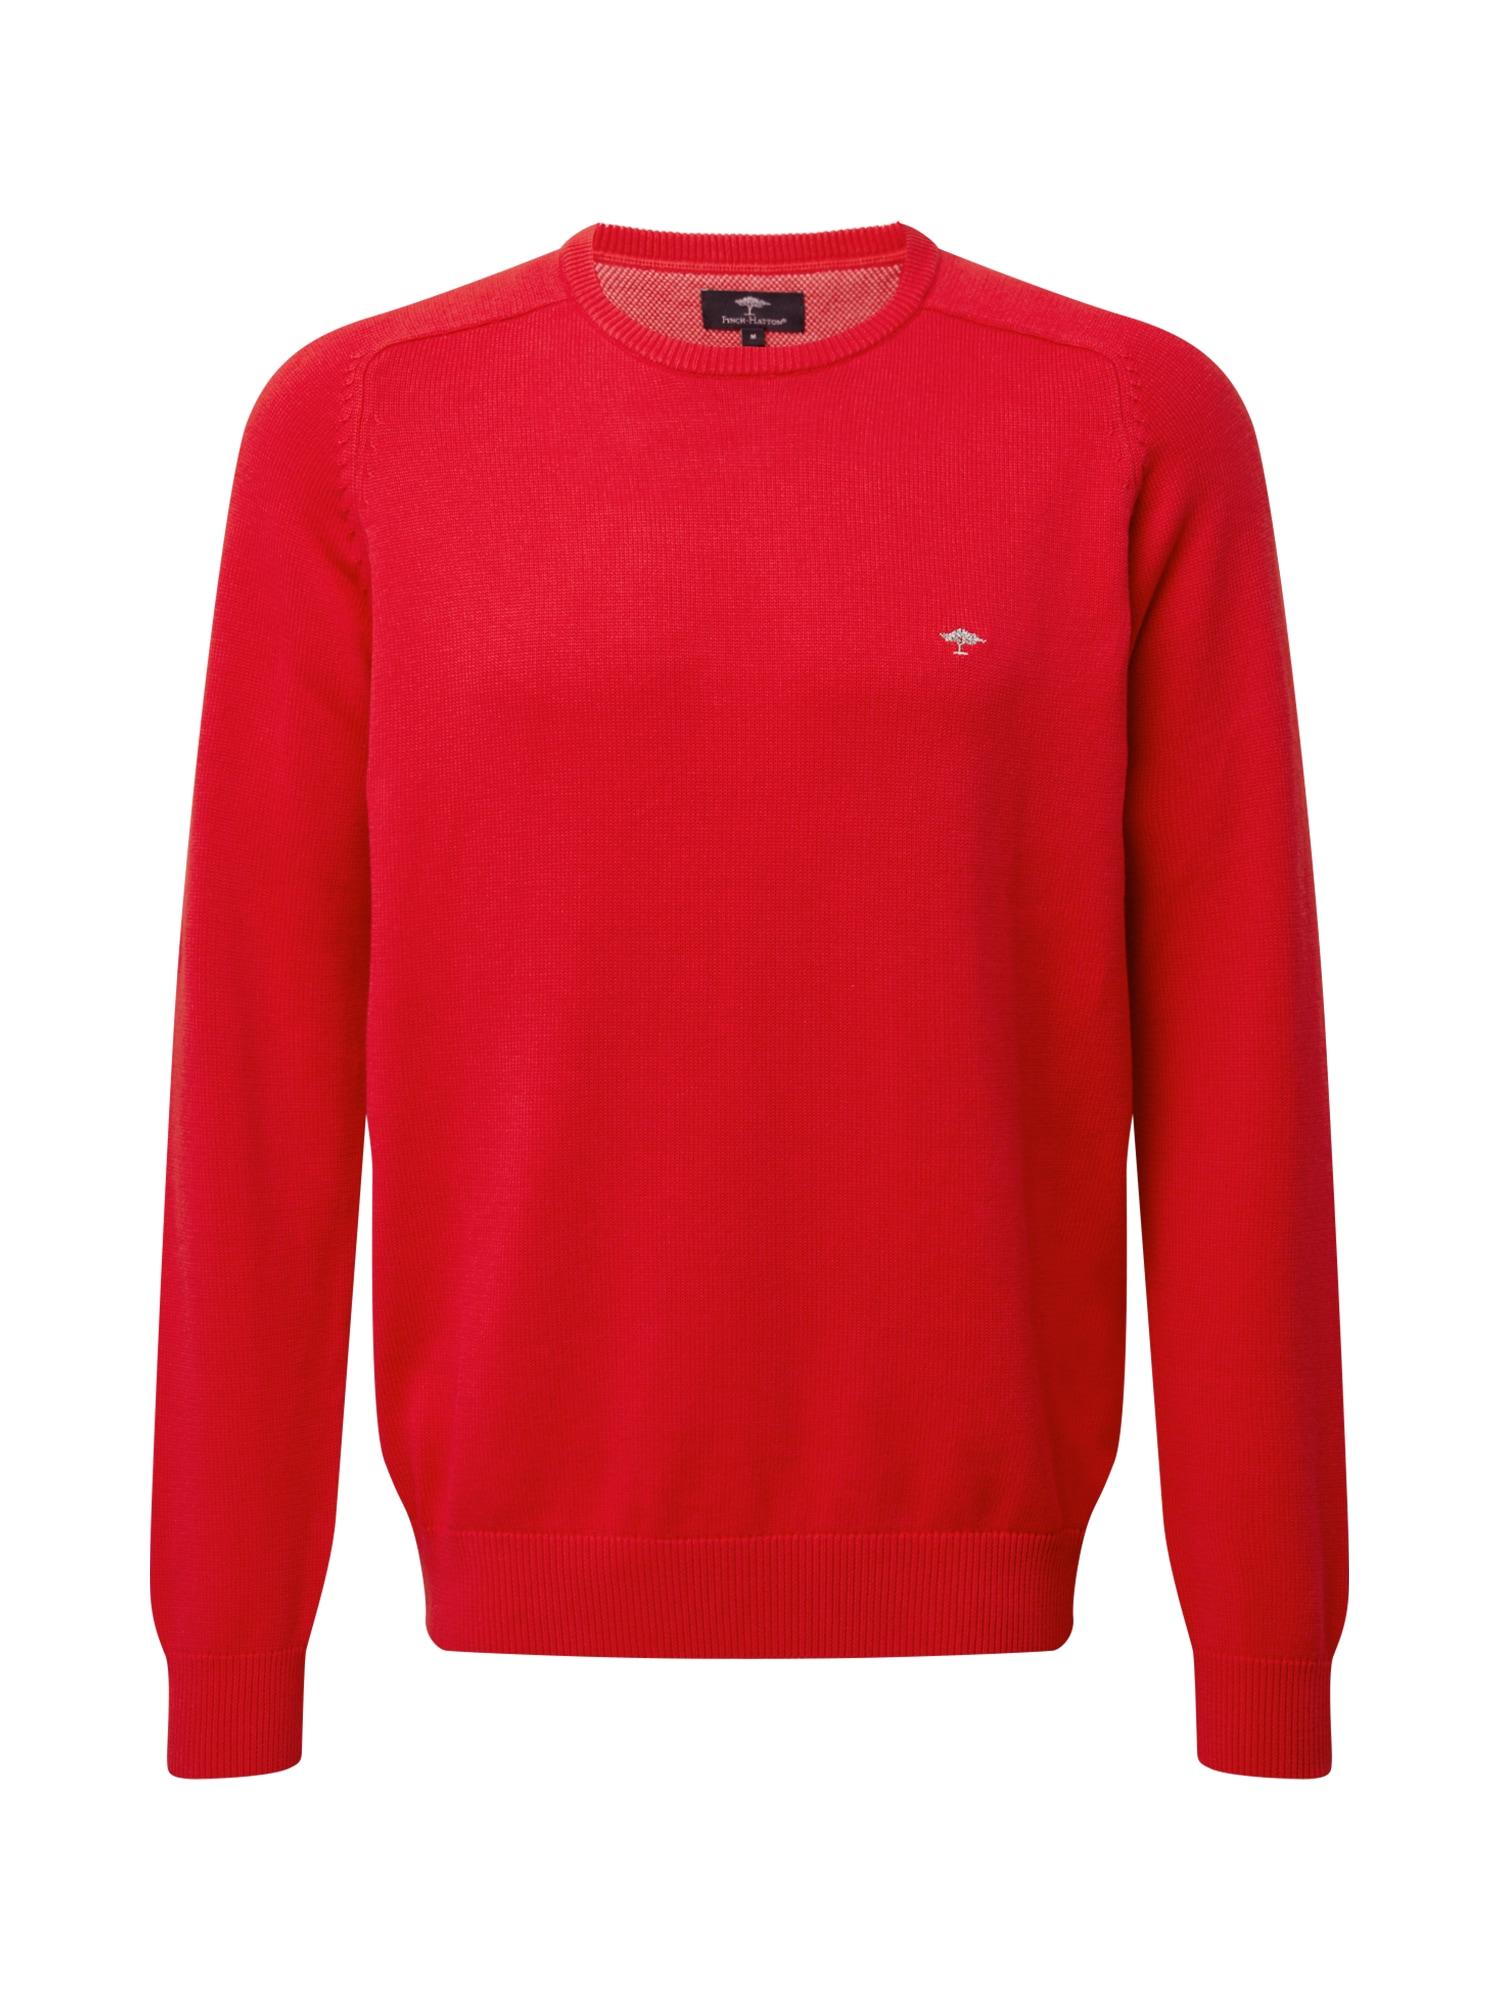 FYNCH-HATTON Megztinis raudona